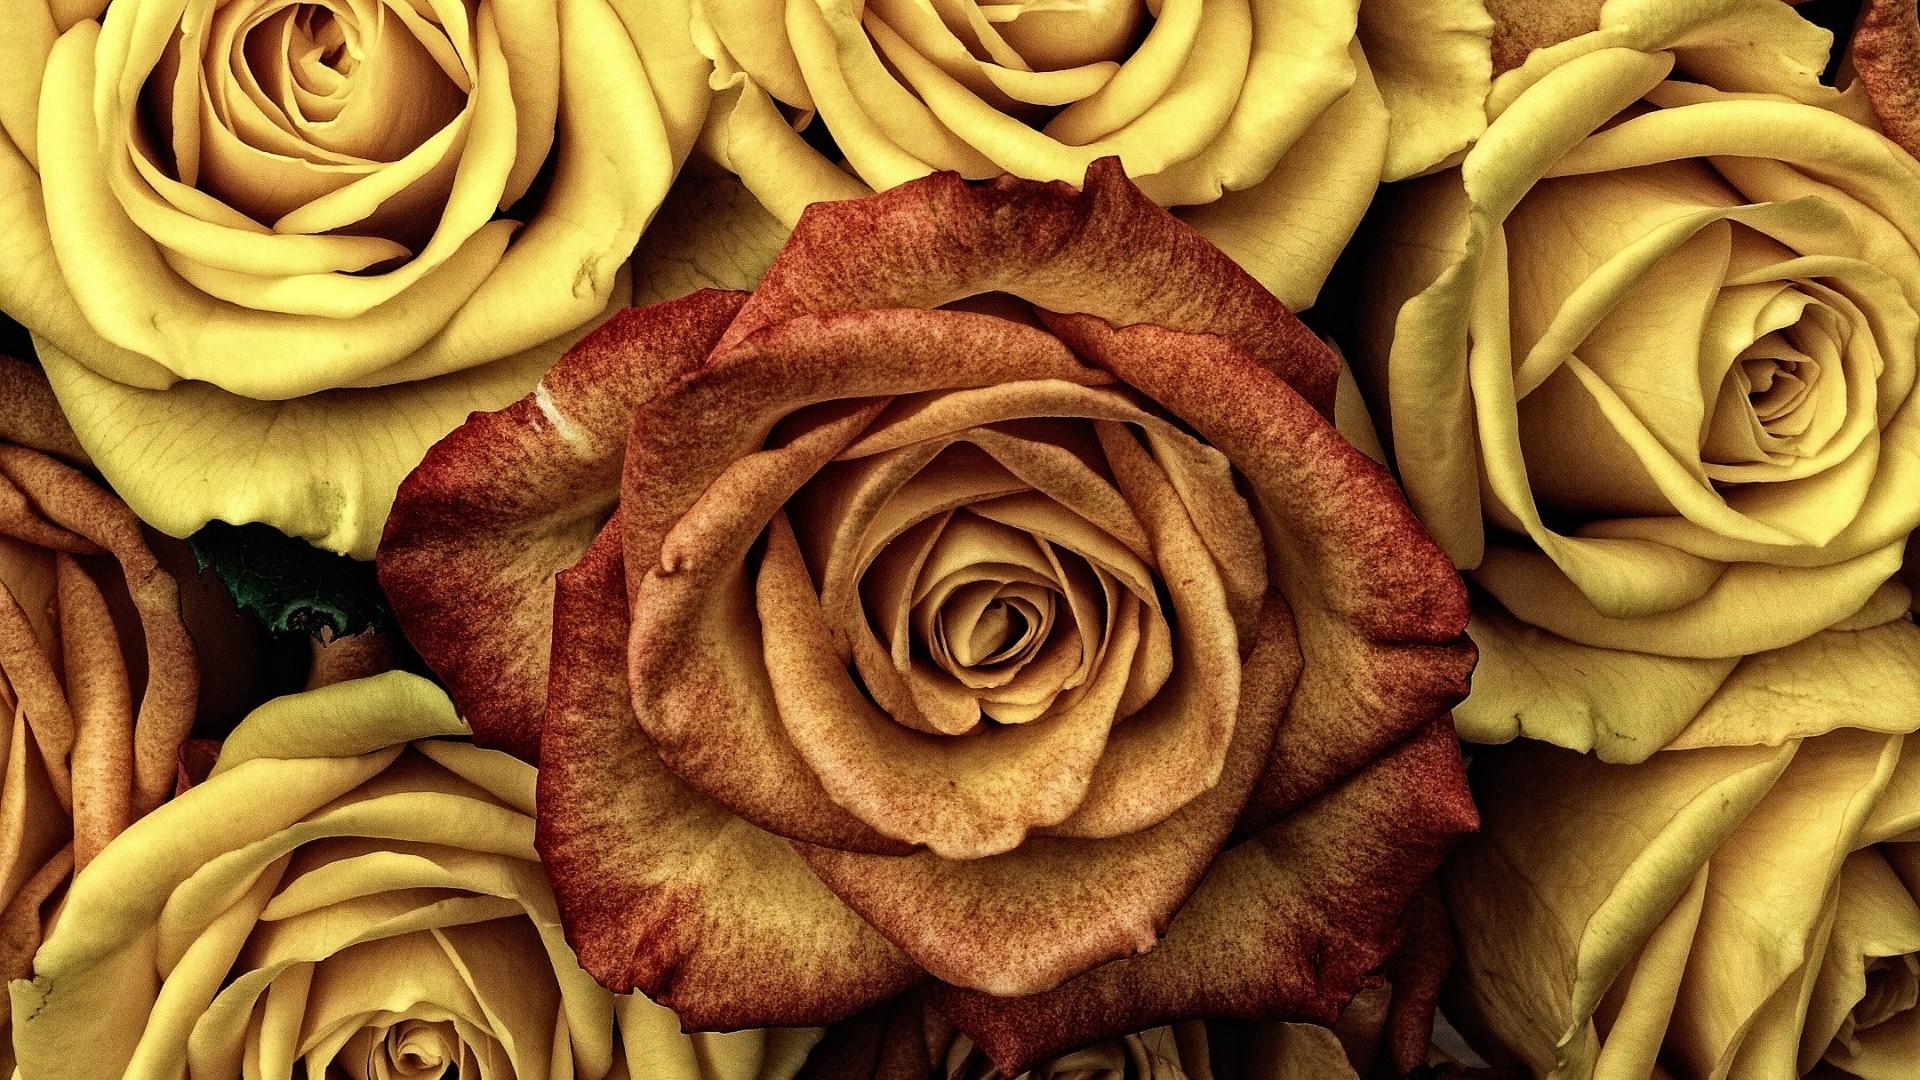 Earth Flower Rose Yellow Flower Orange Color 1920x1080